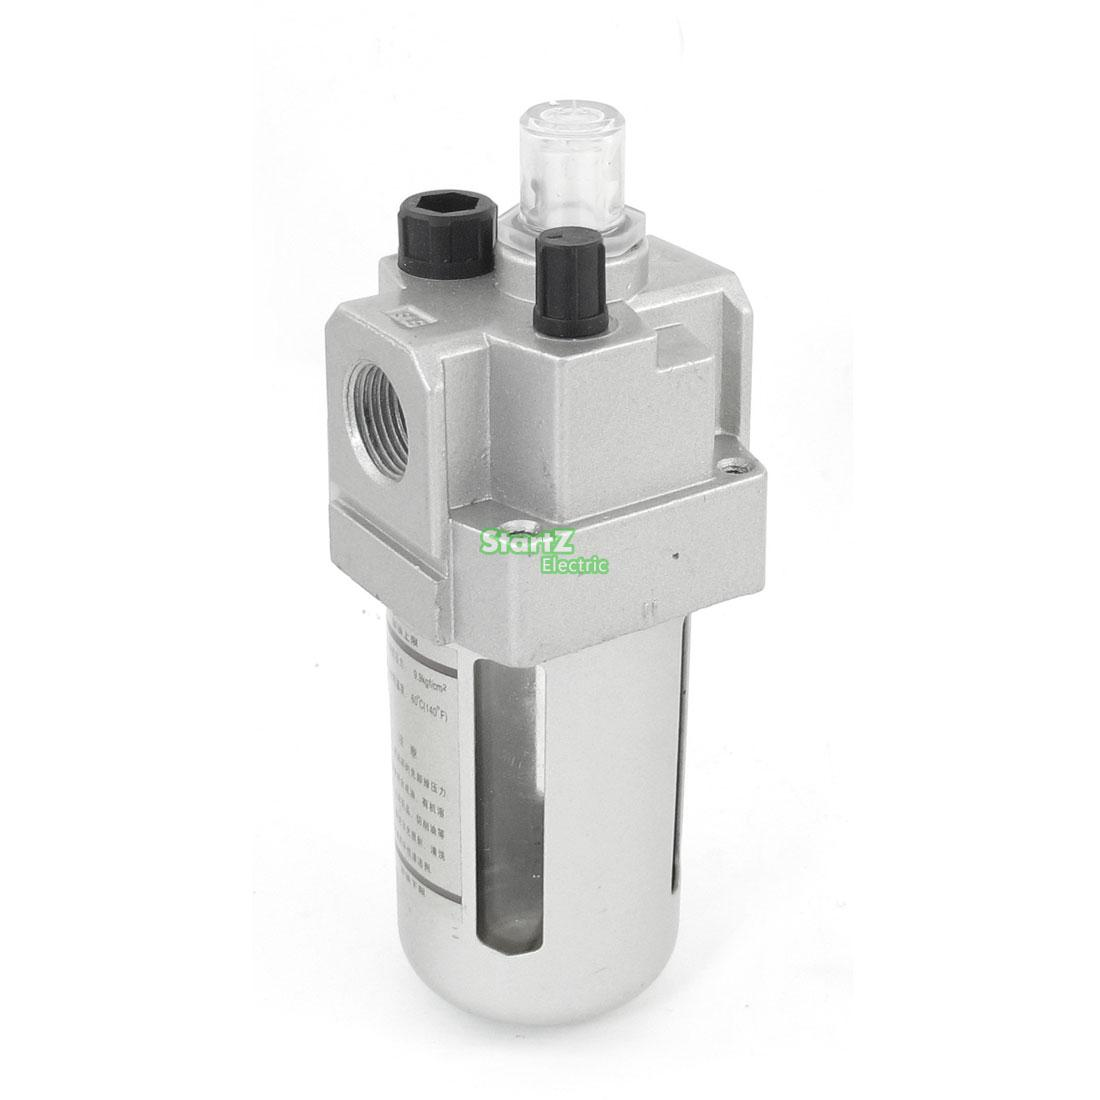 AL4000-04 G1/2''  Air Oiler Pneumatic Oil Fog Lubricator Press al5000 10 g1 air oiler pneumatic oil fog lubricator press